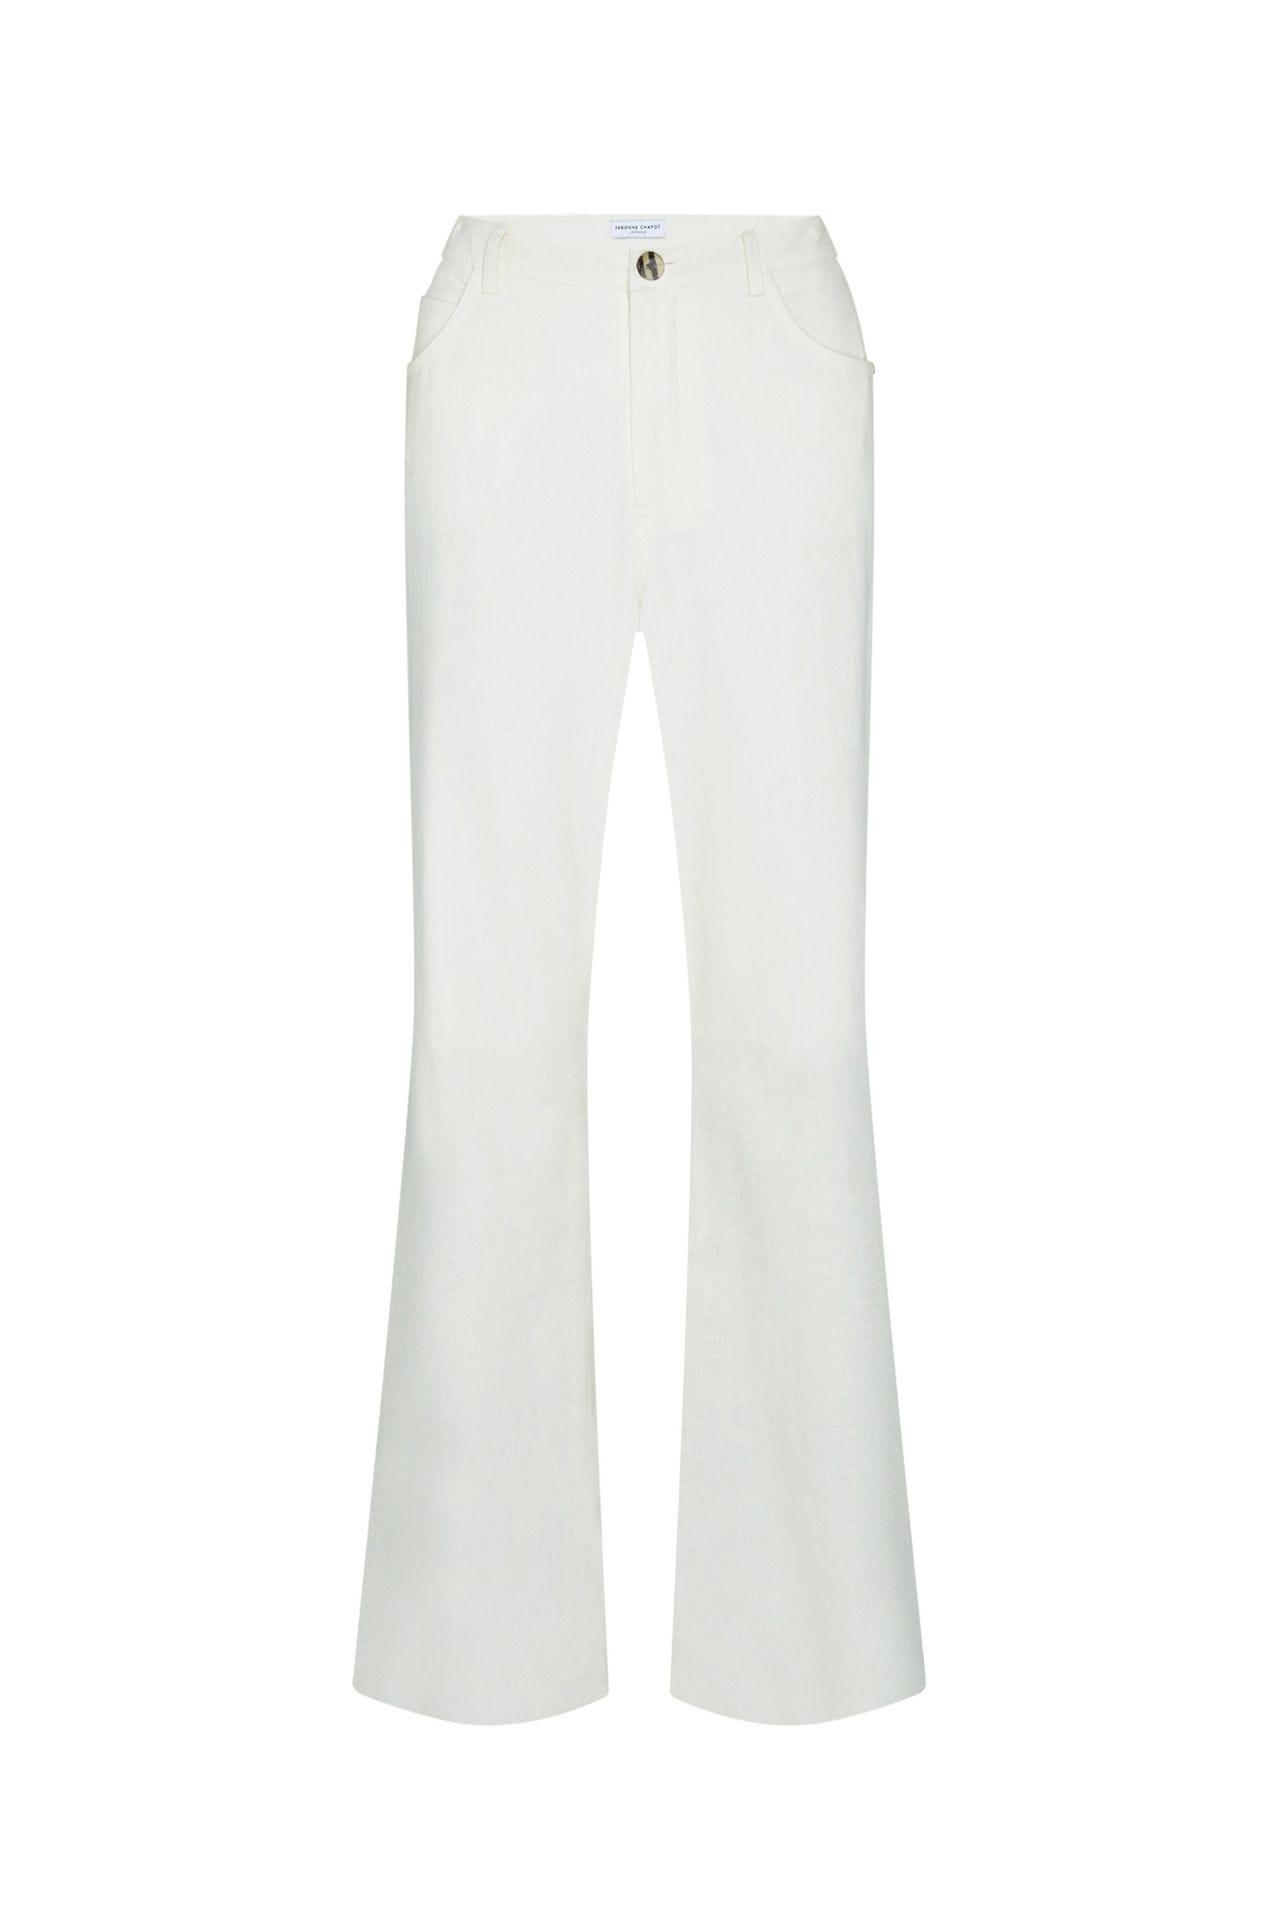 wit creme dames broek - fabienne chapot - sofi trousers - cream white